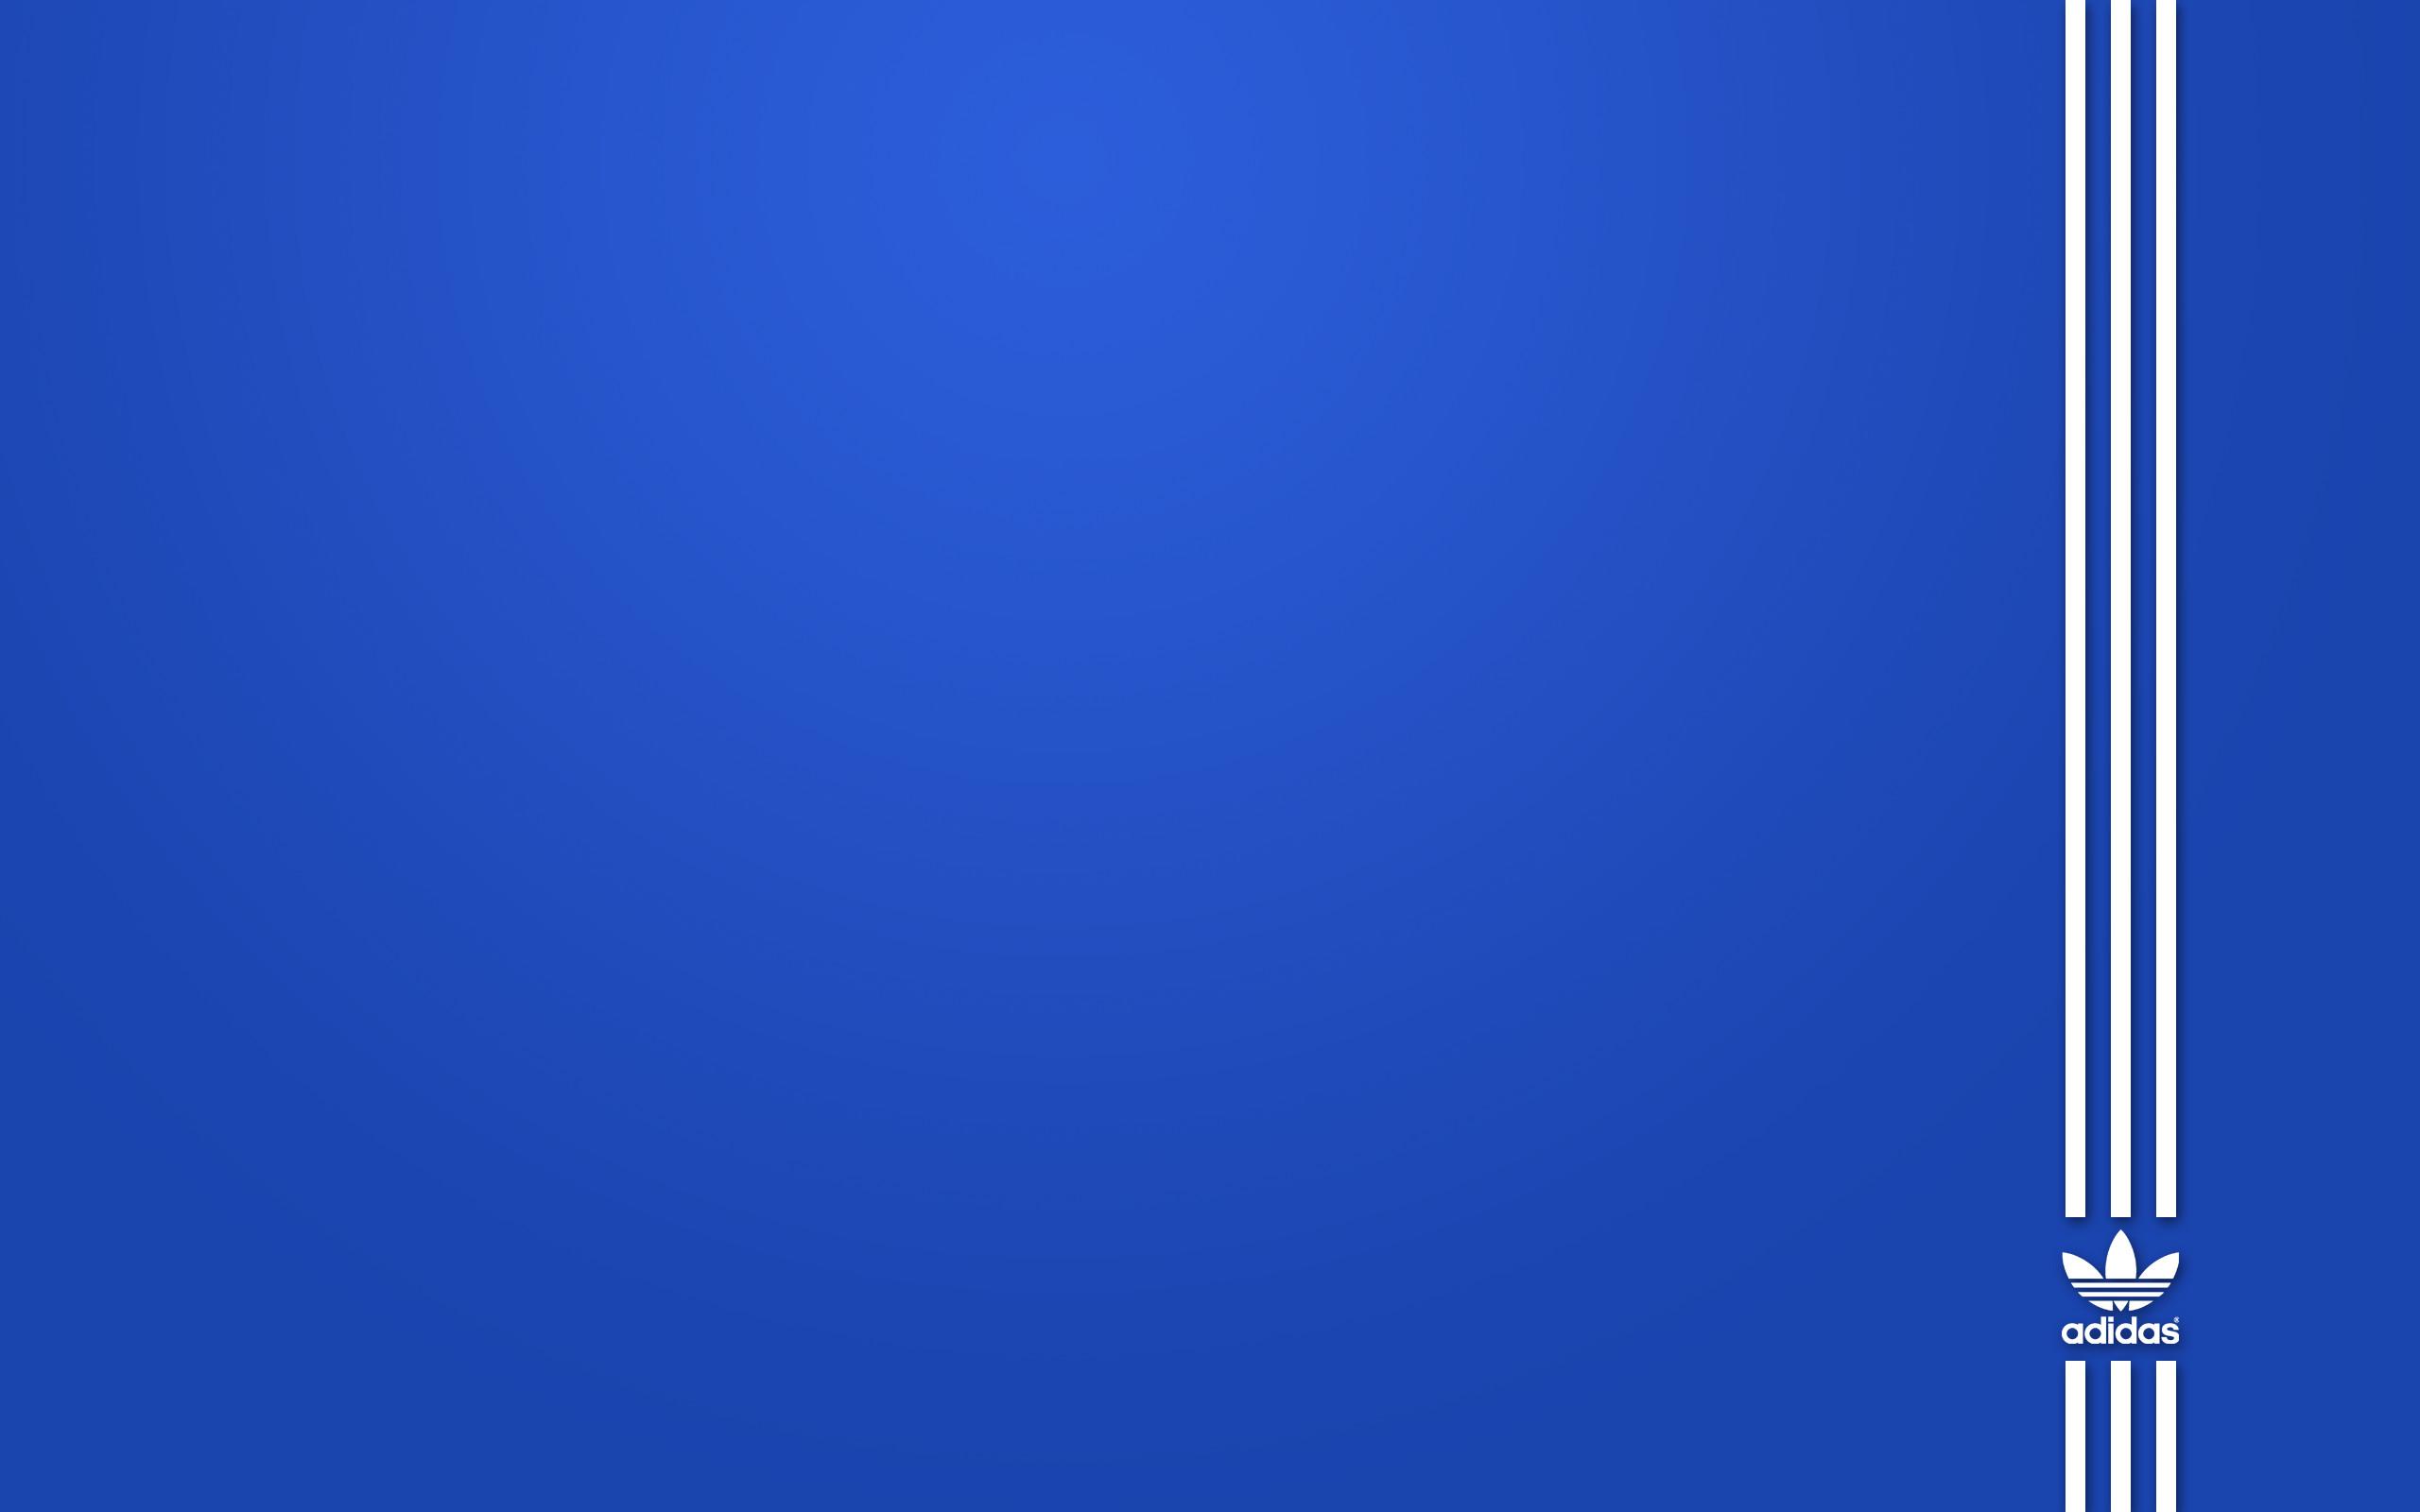 Adidas Wallpaper High Definition …